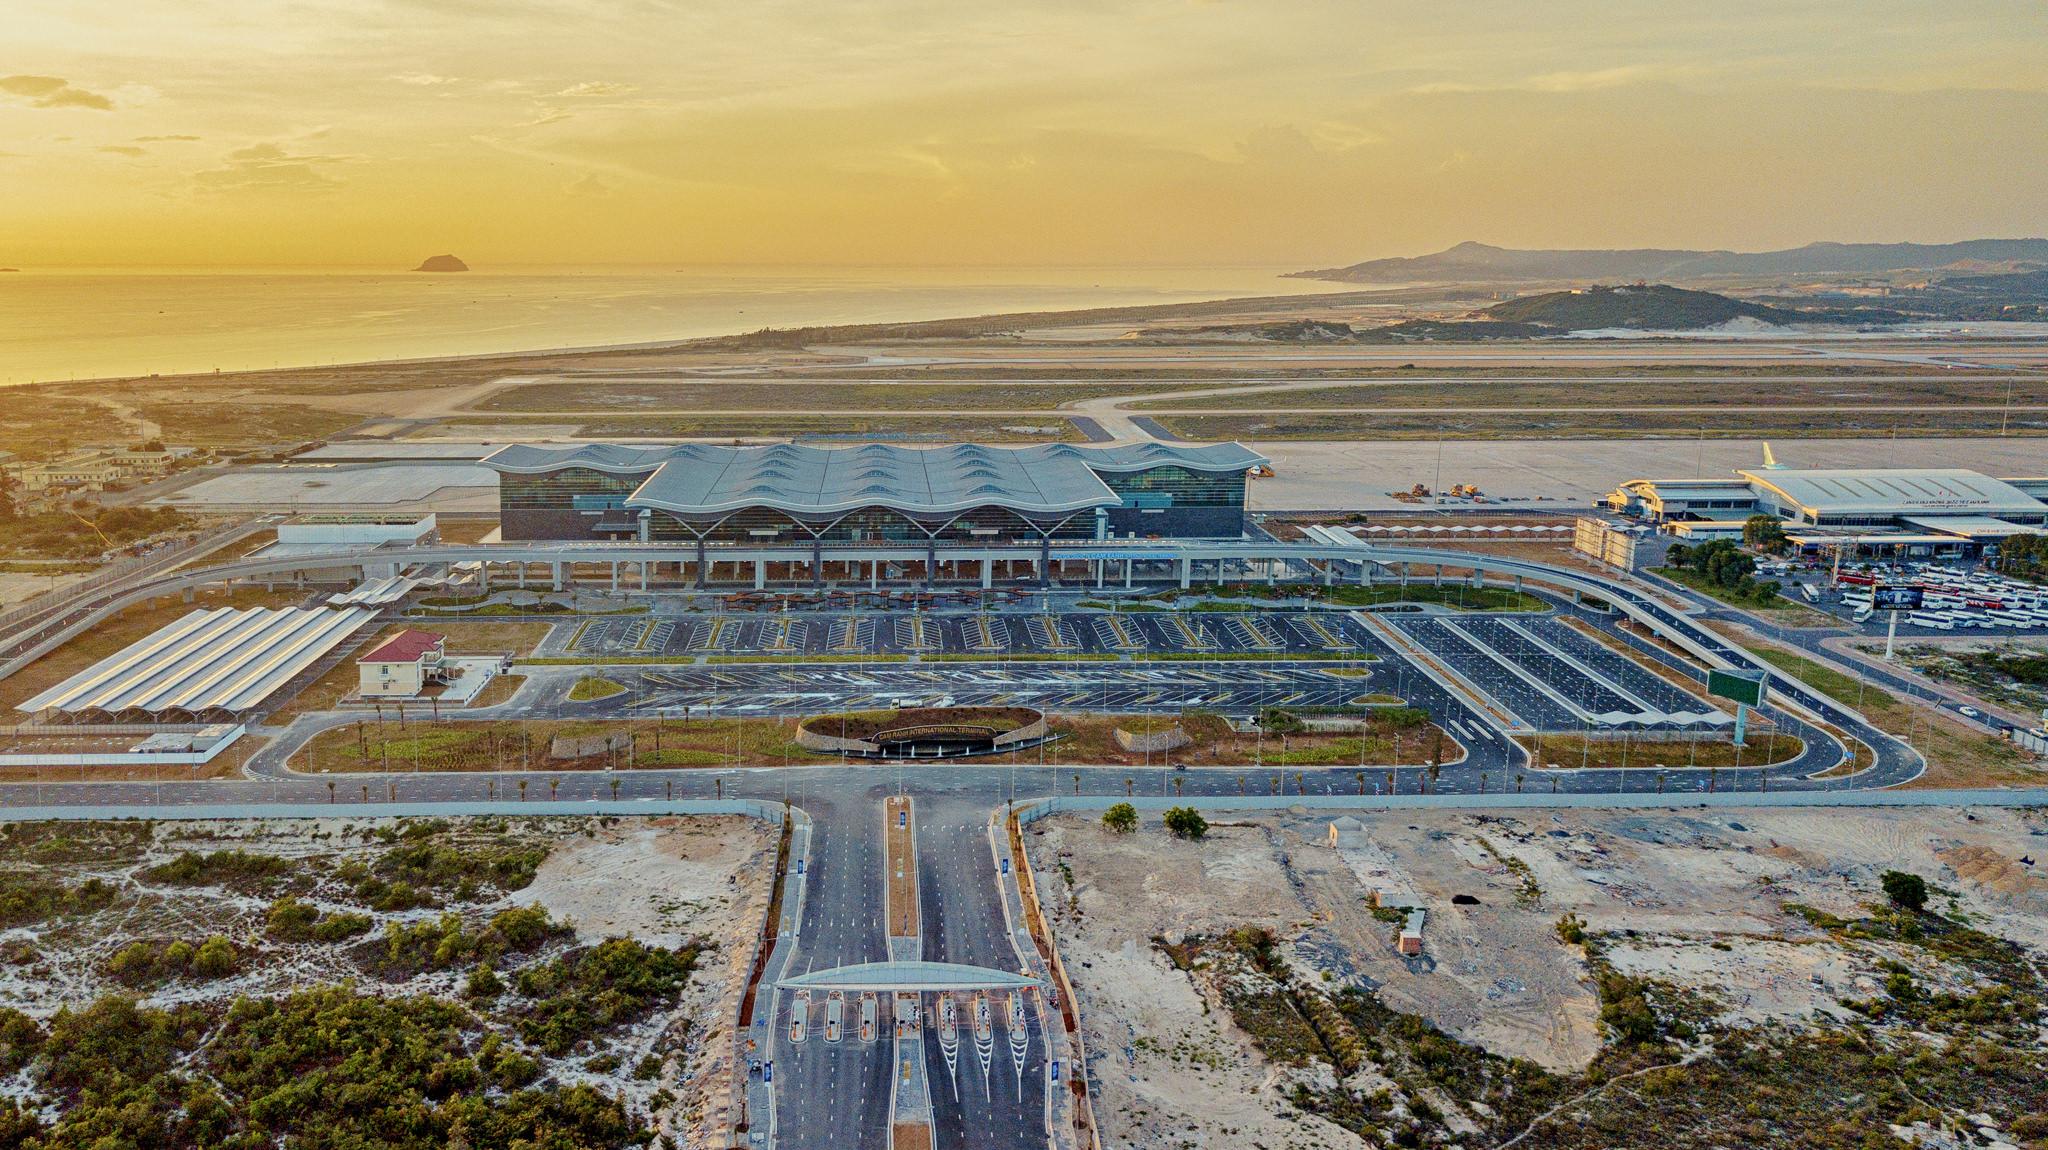 20180626 - Cam Ranh Airport - Architecture - Flycam - 0009.jpg